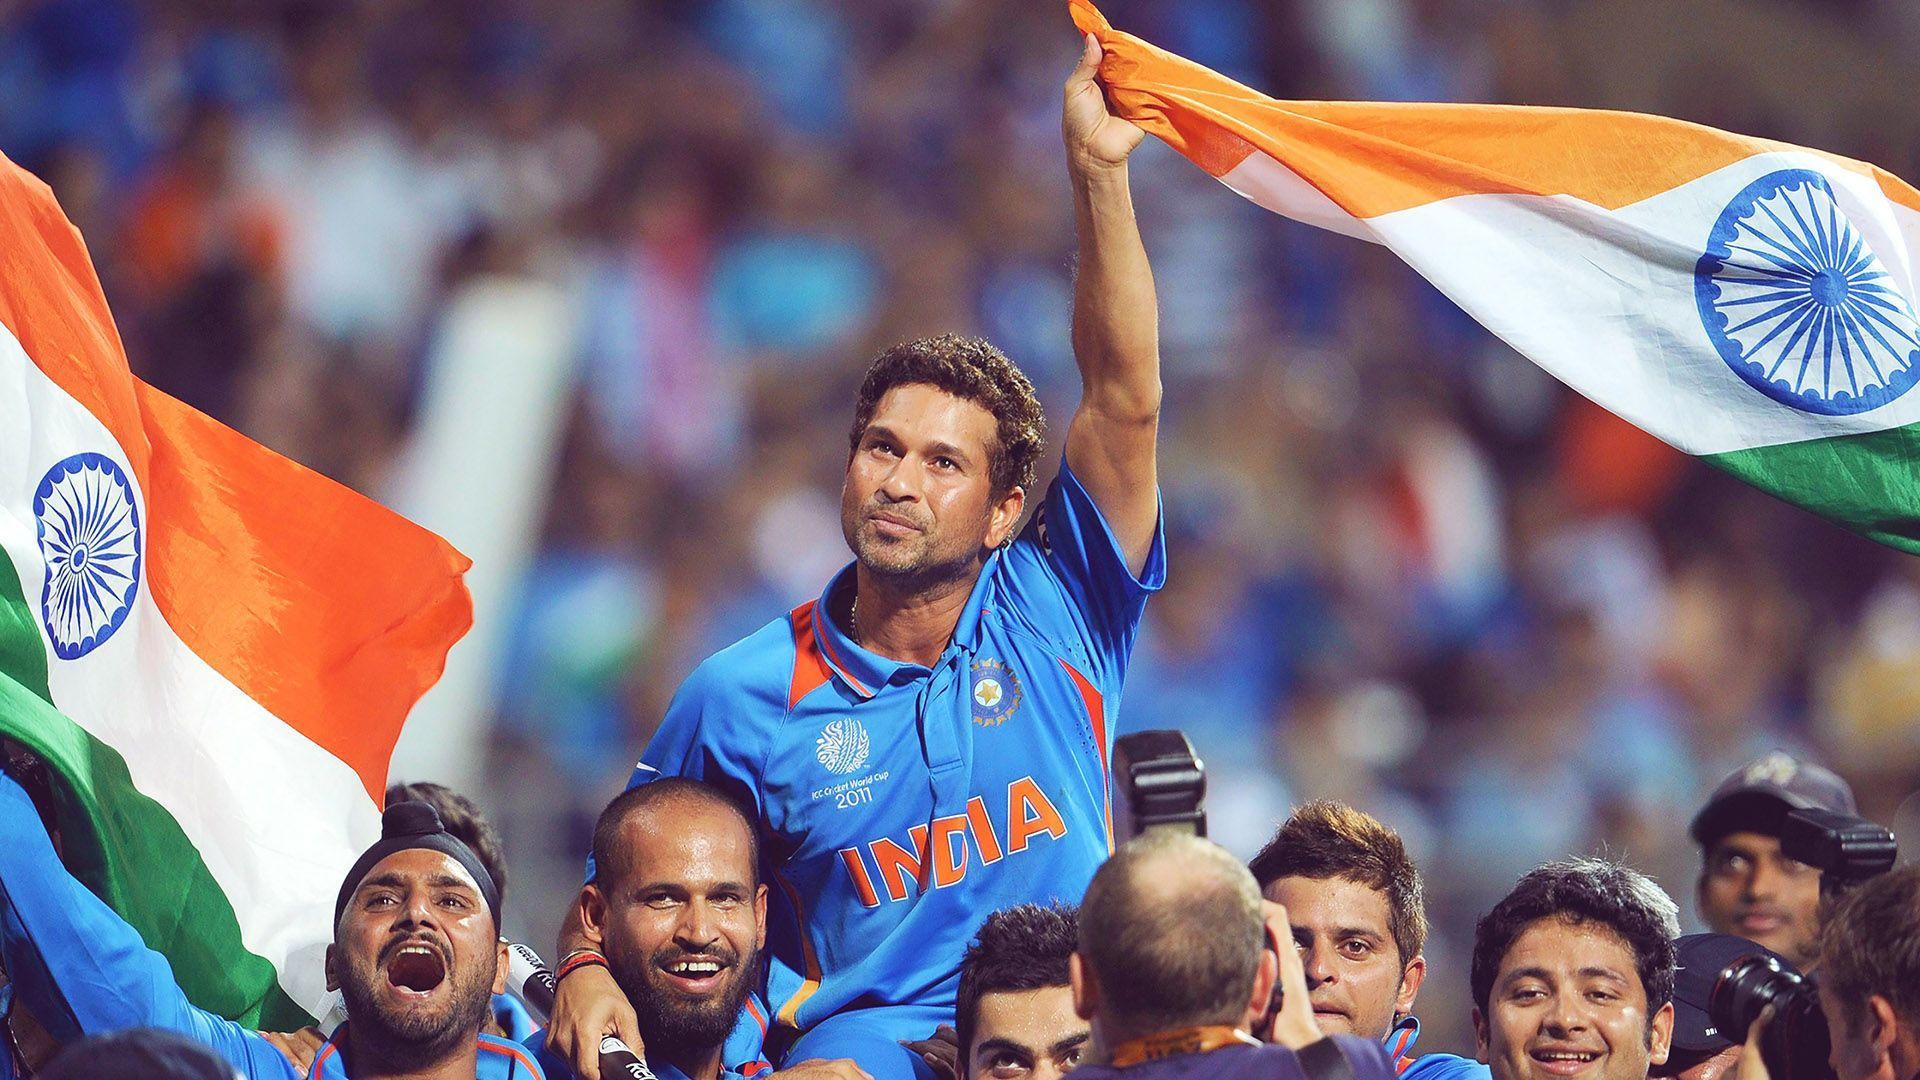 India Cricket Team Background 9